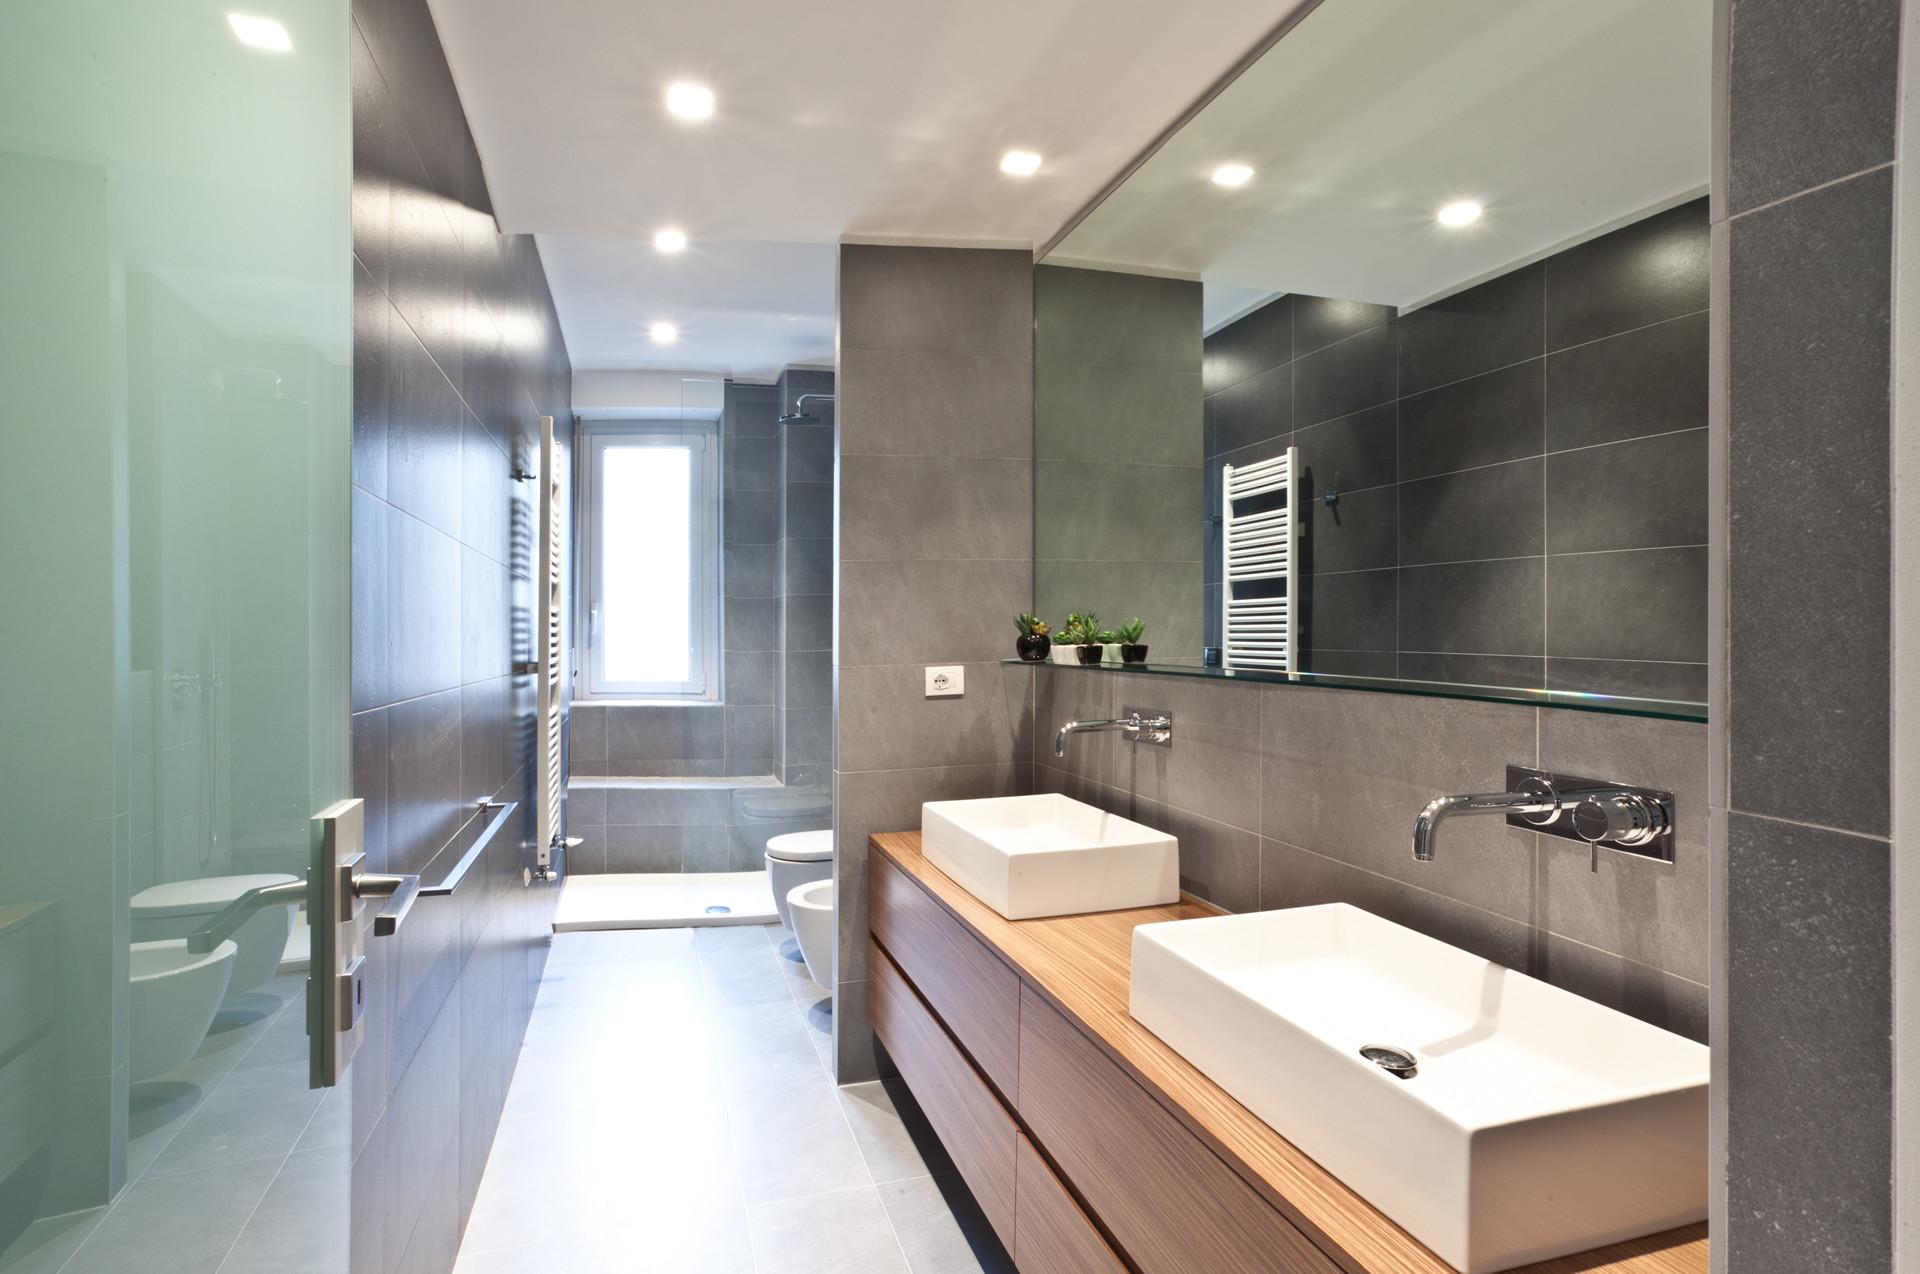 Wisp-Architects- Oxilia Apartment 16